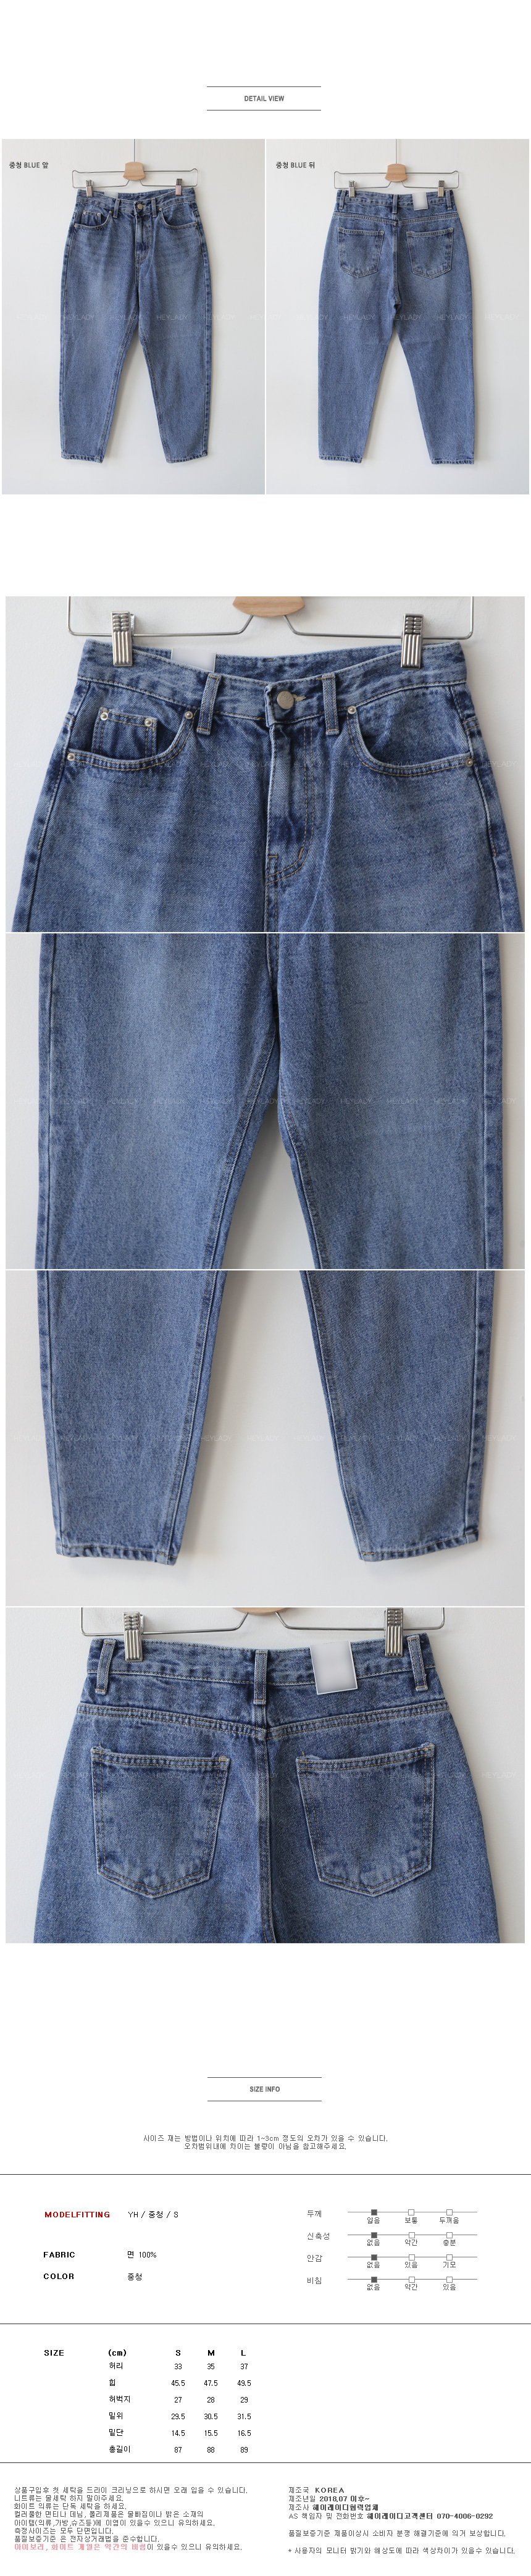 Jay's denim Baggy pants